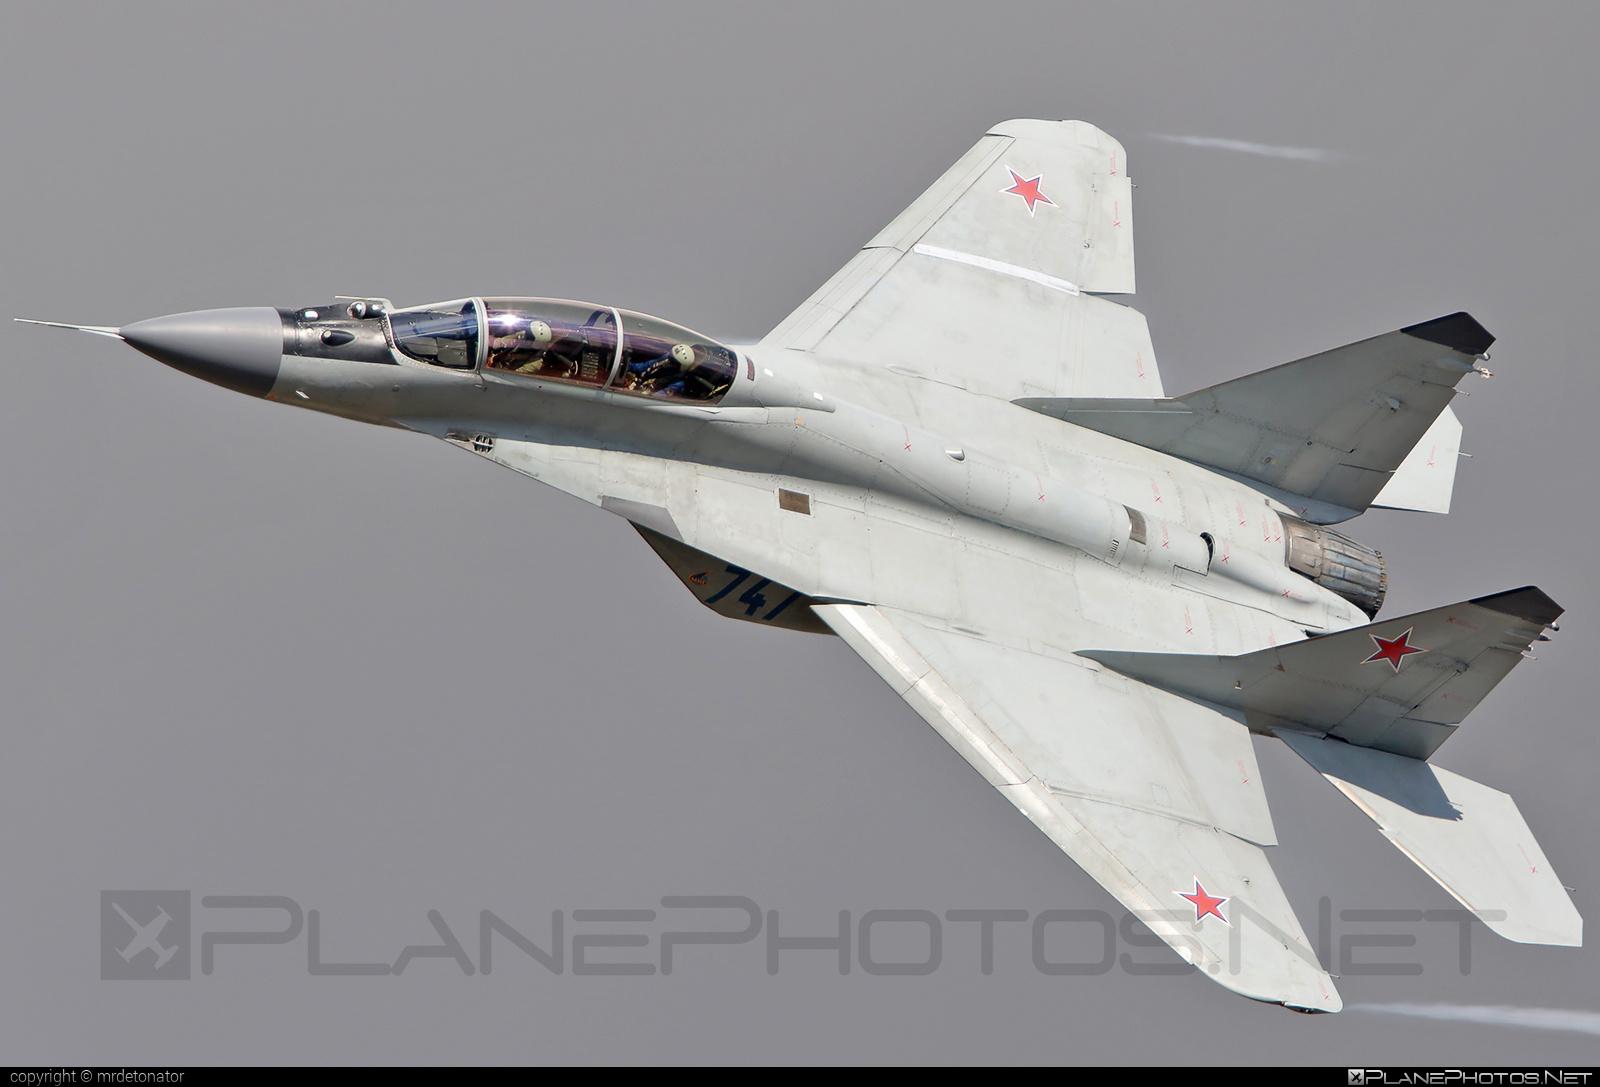 RSK MiG Mikoyan-Gurevich MiG-29M2 - 747